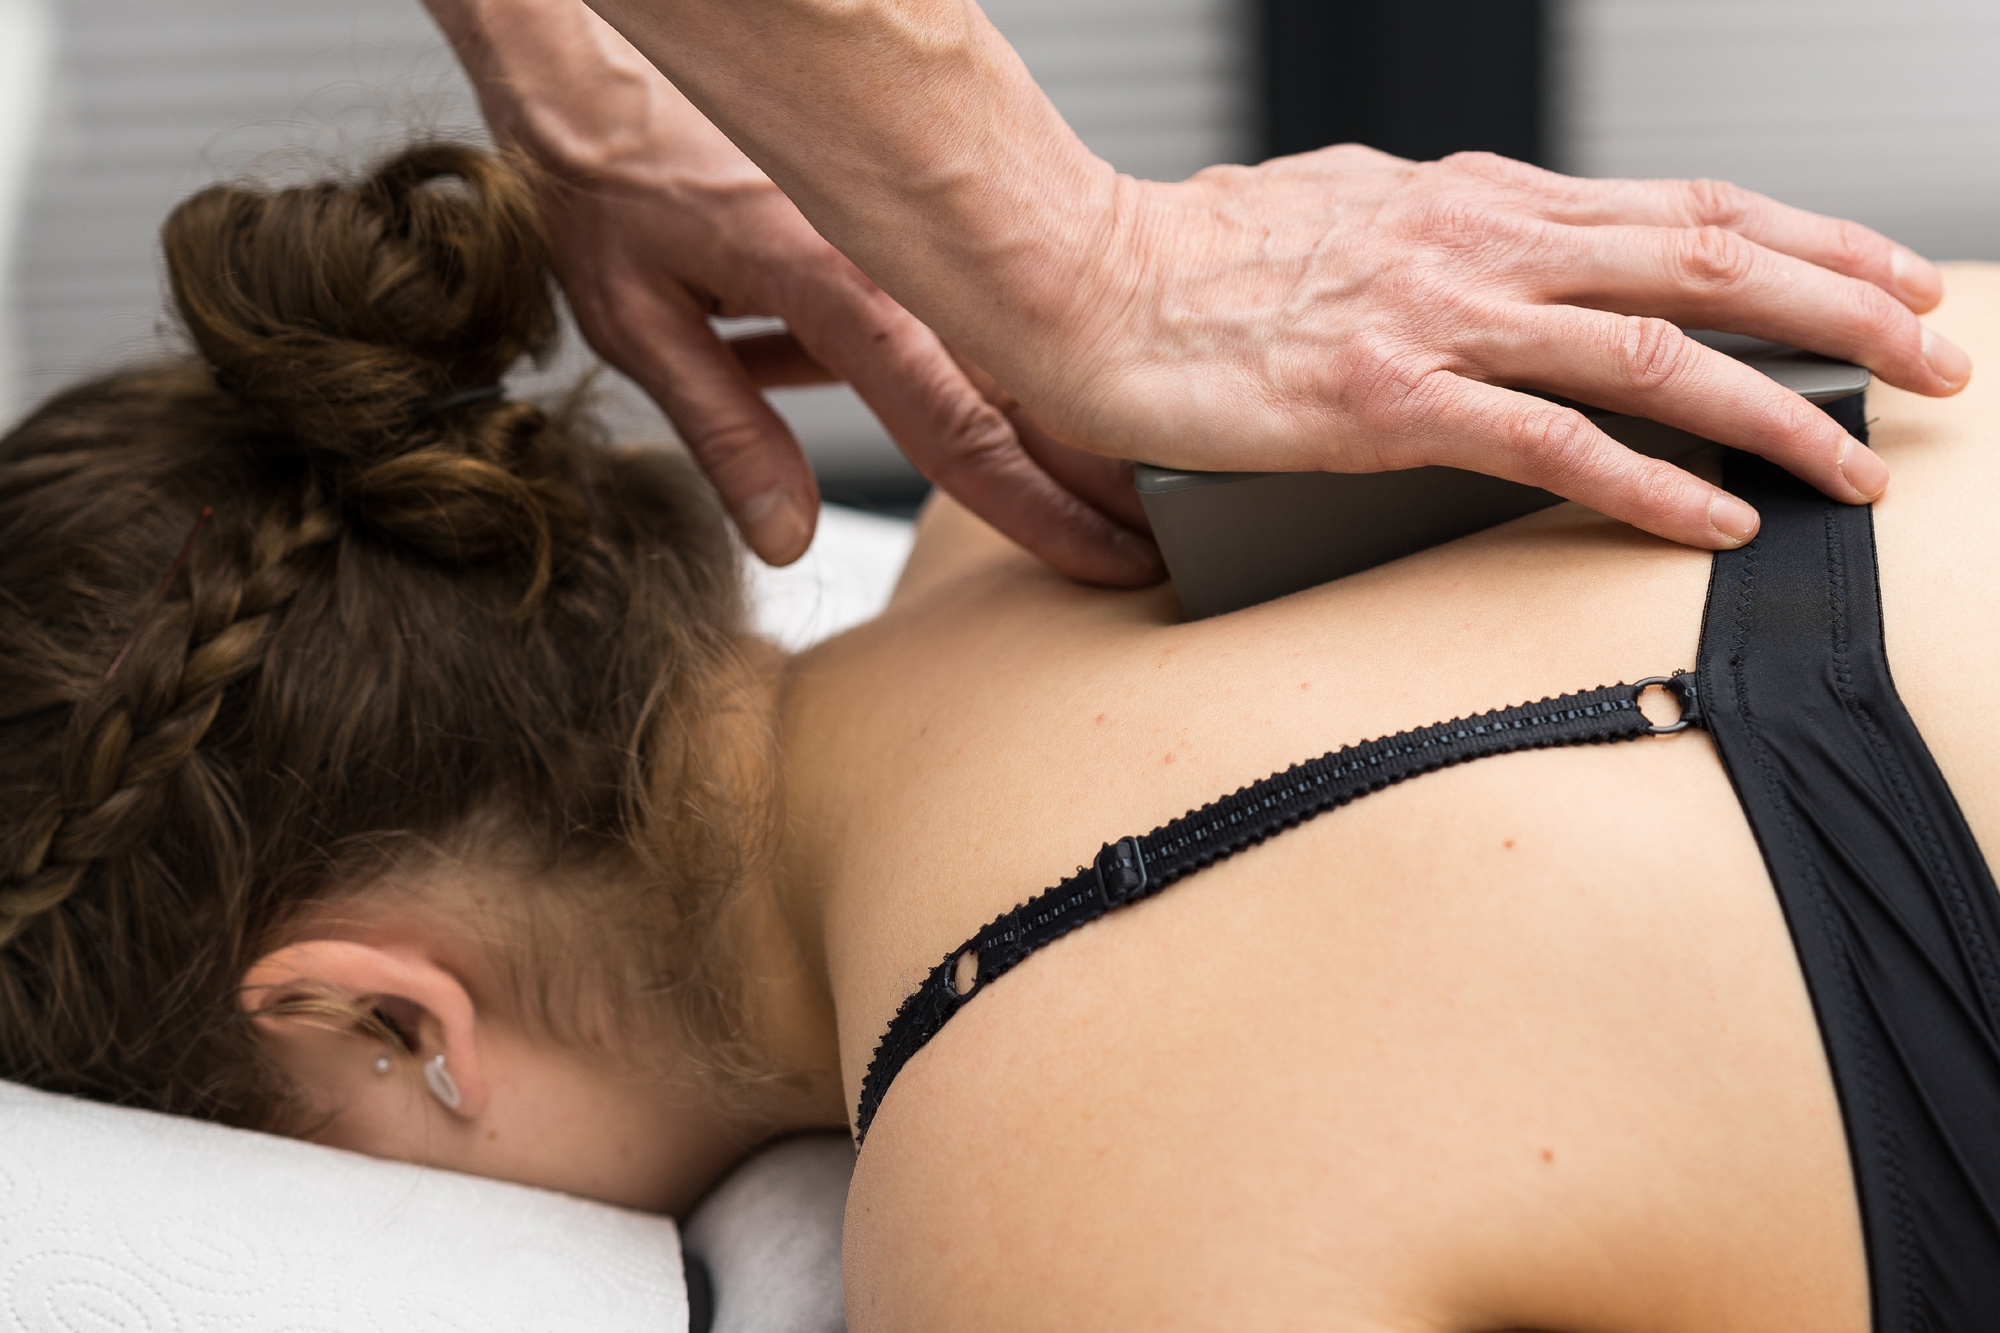 PTS Physiotherapie Schenefeld GmbH | Manuelle Therapie